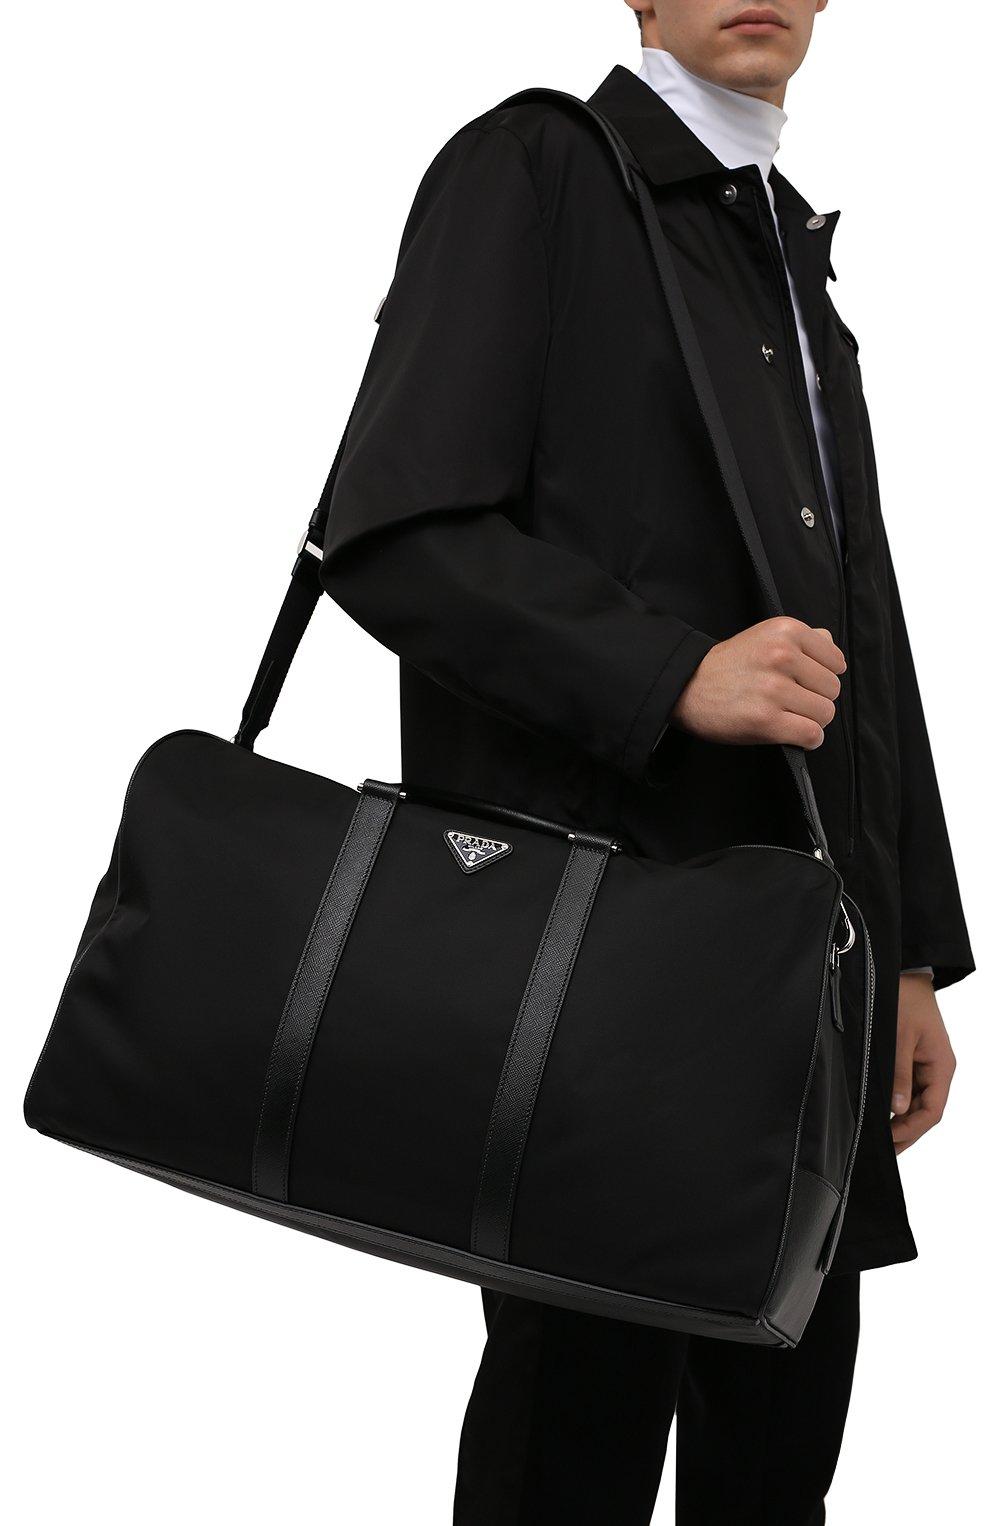 Мужская дорожная сумка PRADA черного цвета, арт. 2VC007-2DMH-F0002-SOO | Фото 5 (Материал: Текстиль)